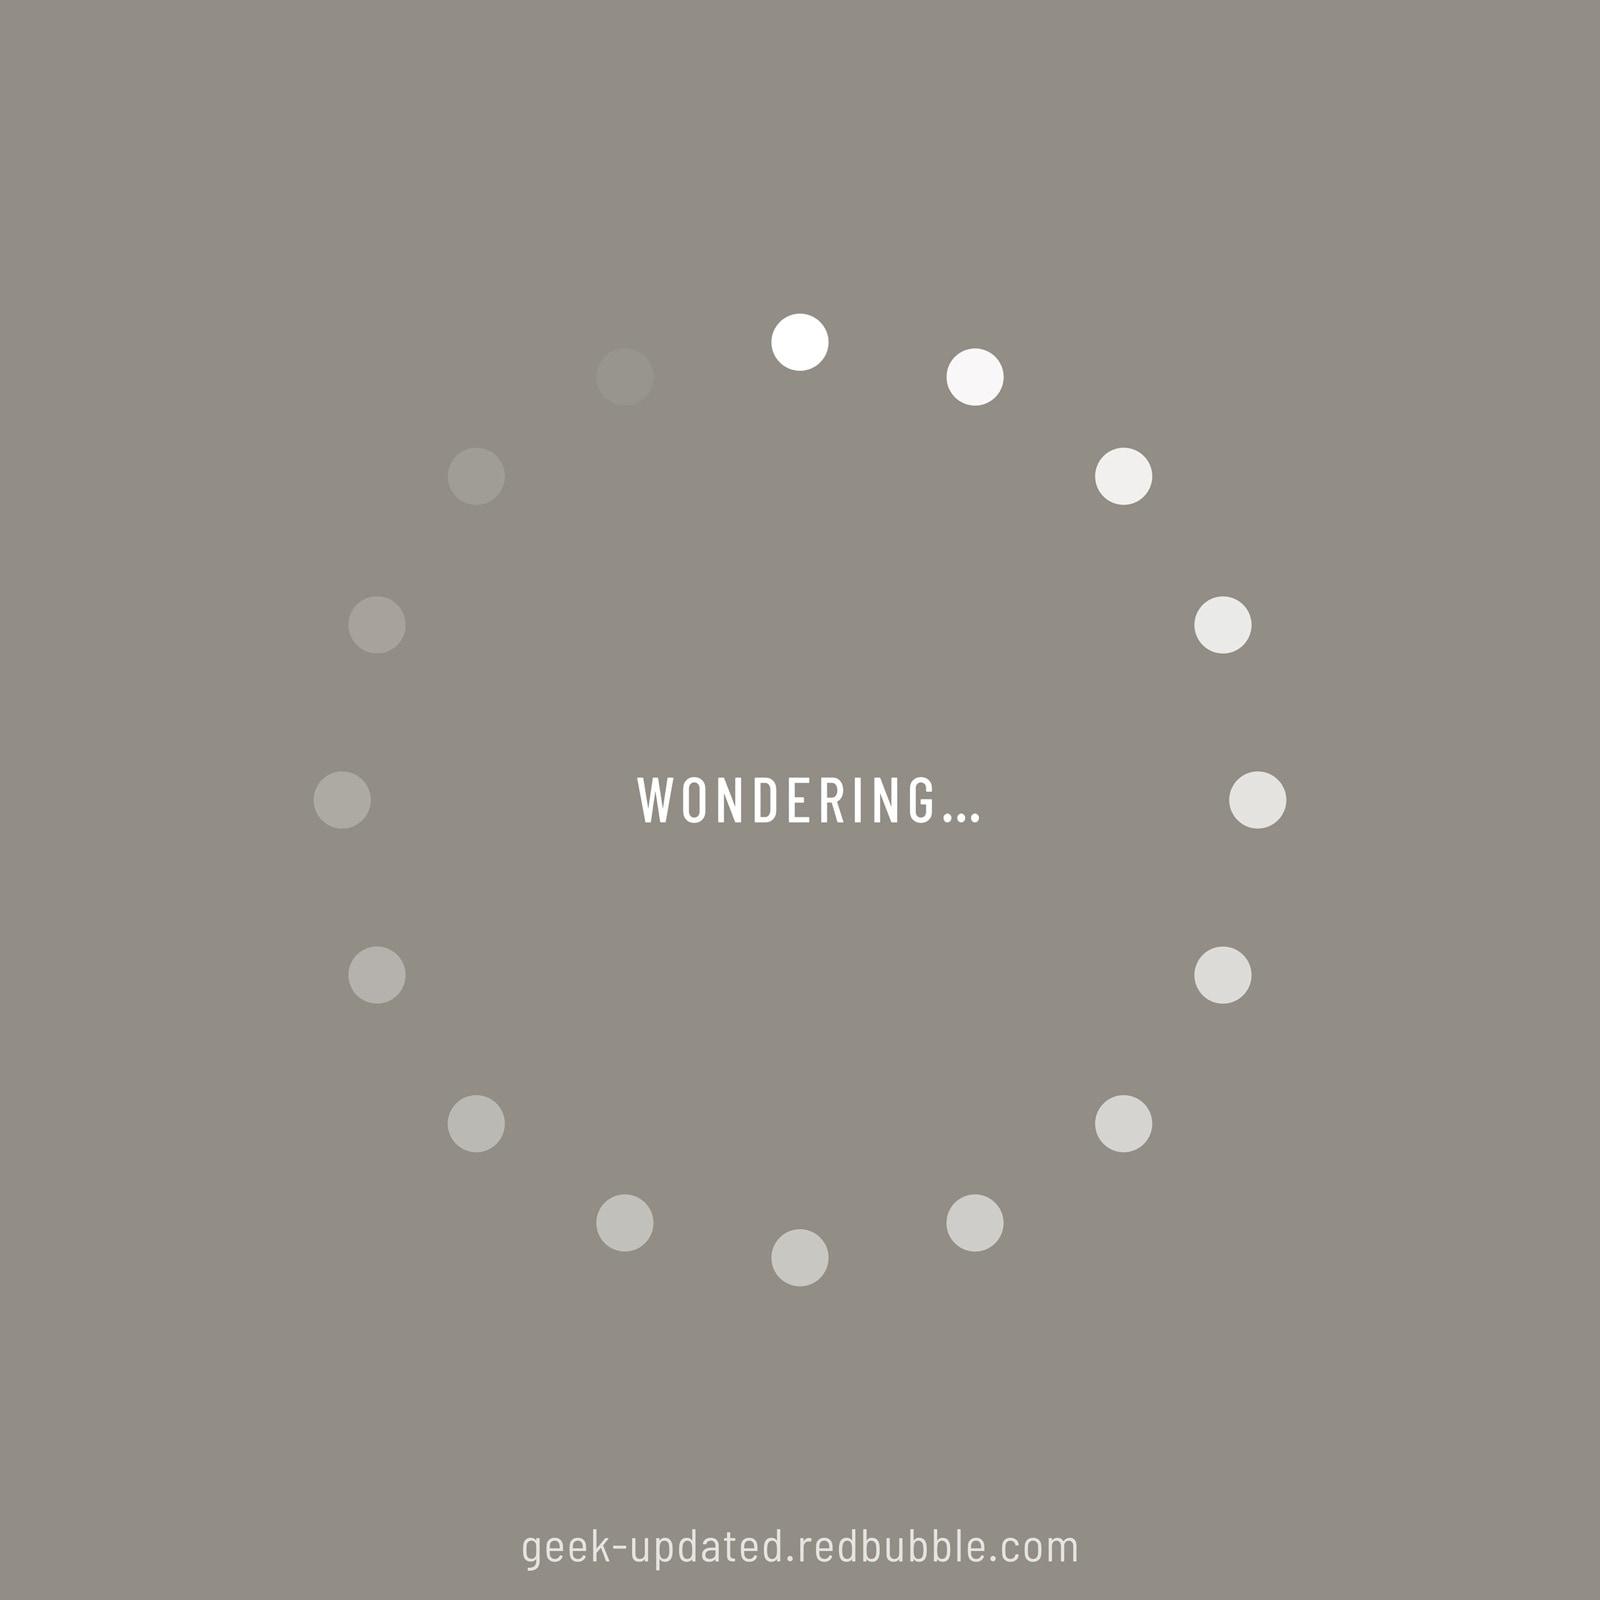 Wondering-loading icon - design by Piotr Kowalczyk